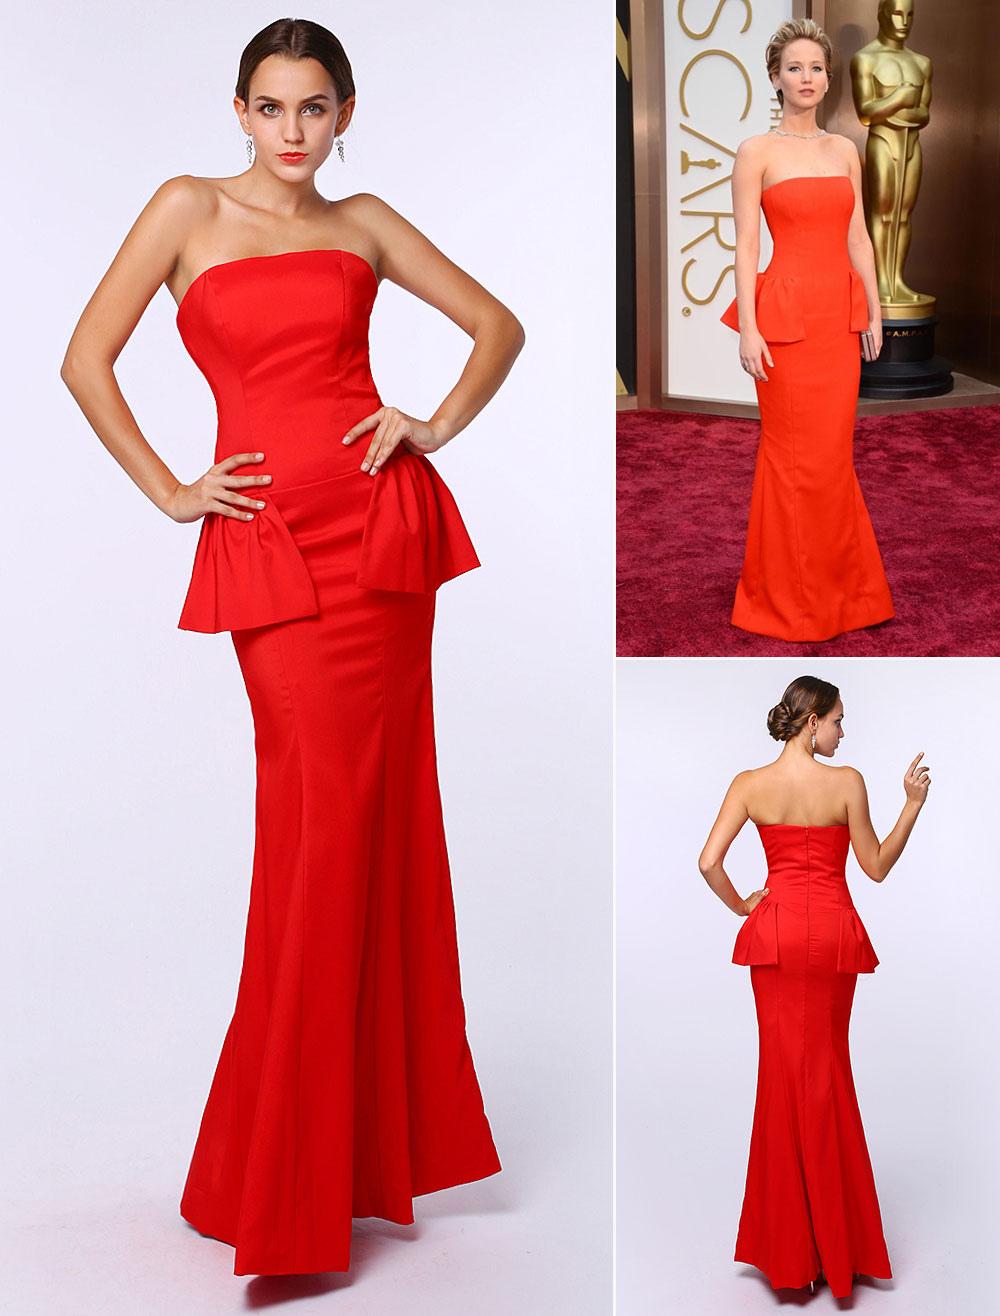 Mermaid Red Satin Peplum Strapless Floor-Length Evening Dress ...